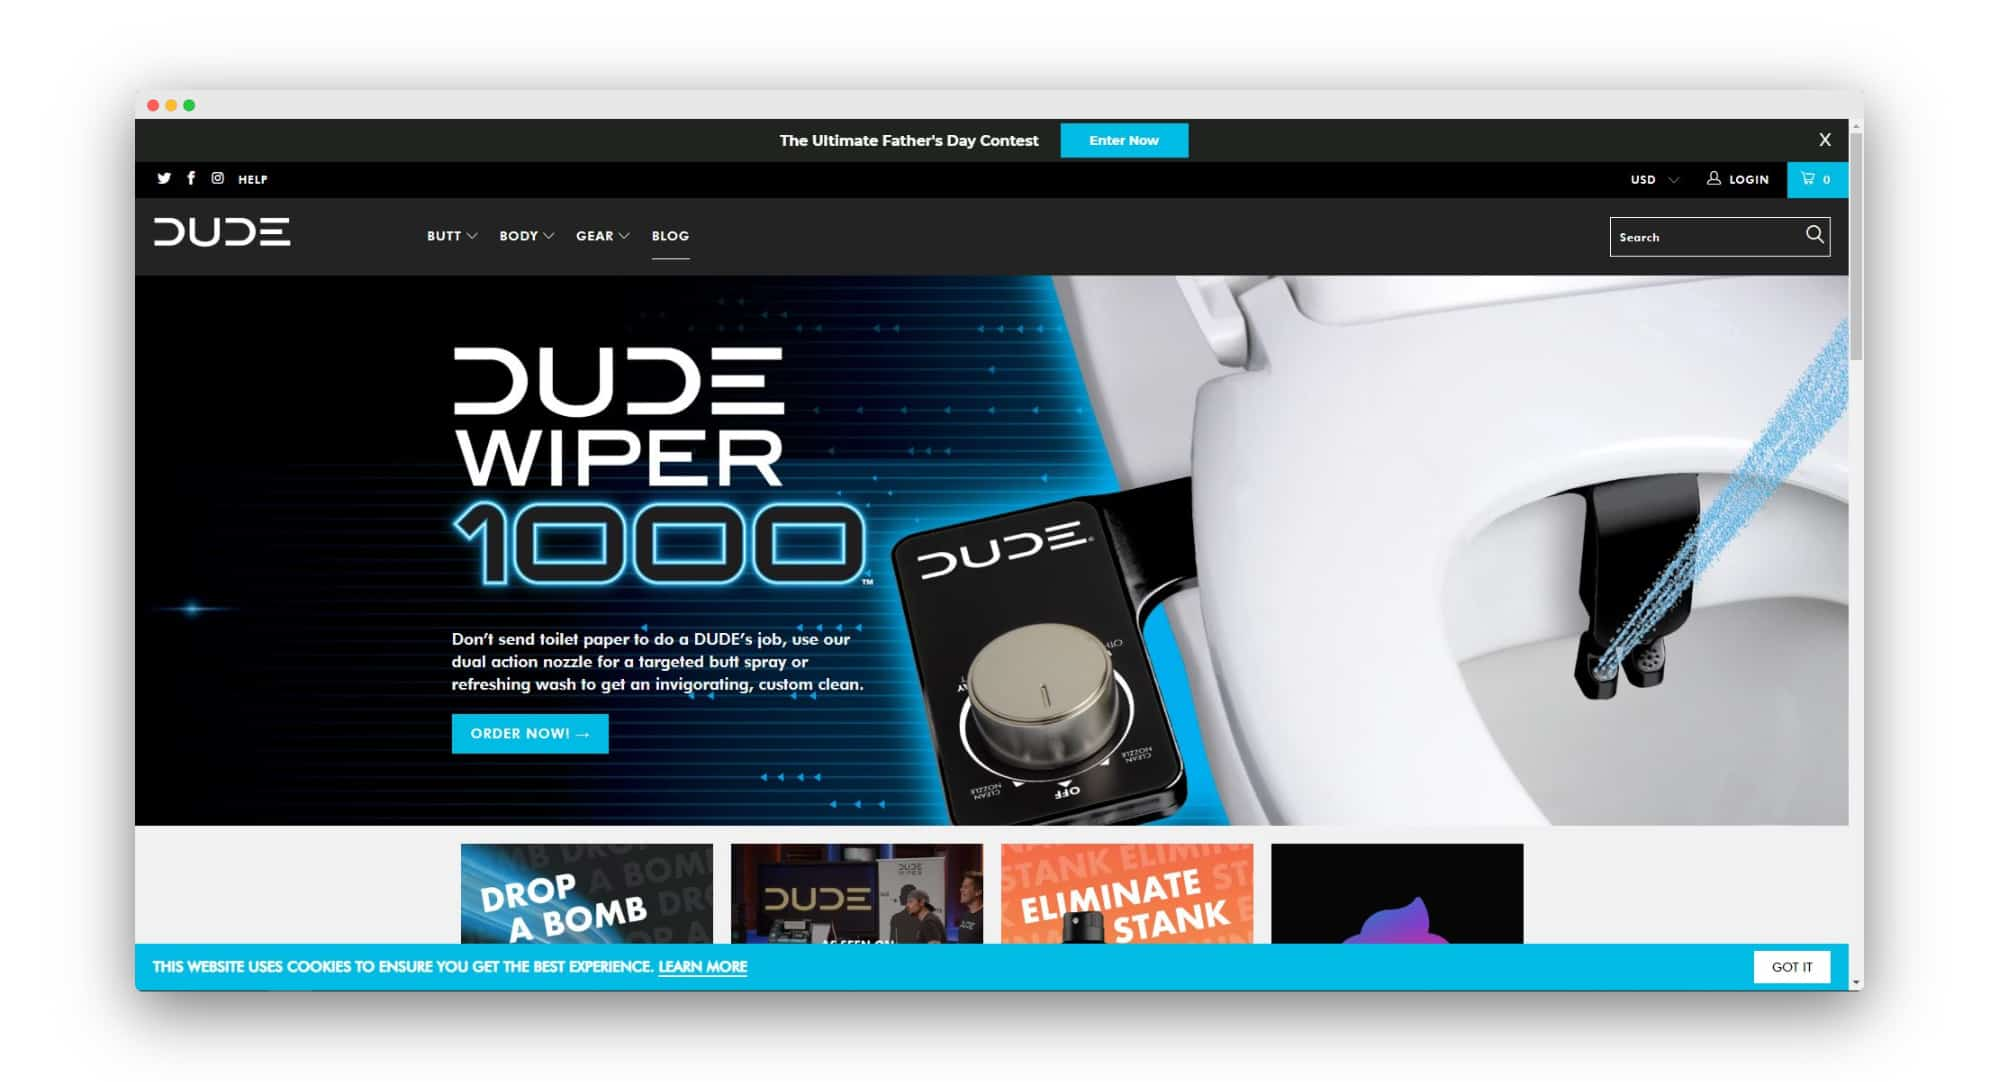 DUDE Wipes DTC Brands